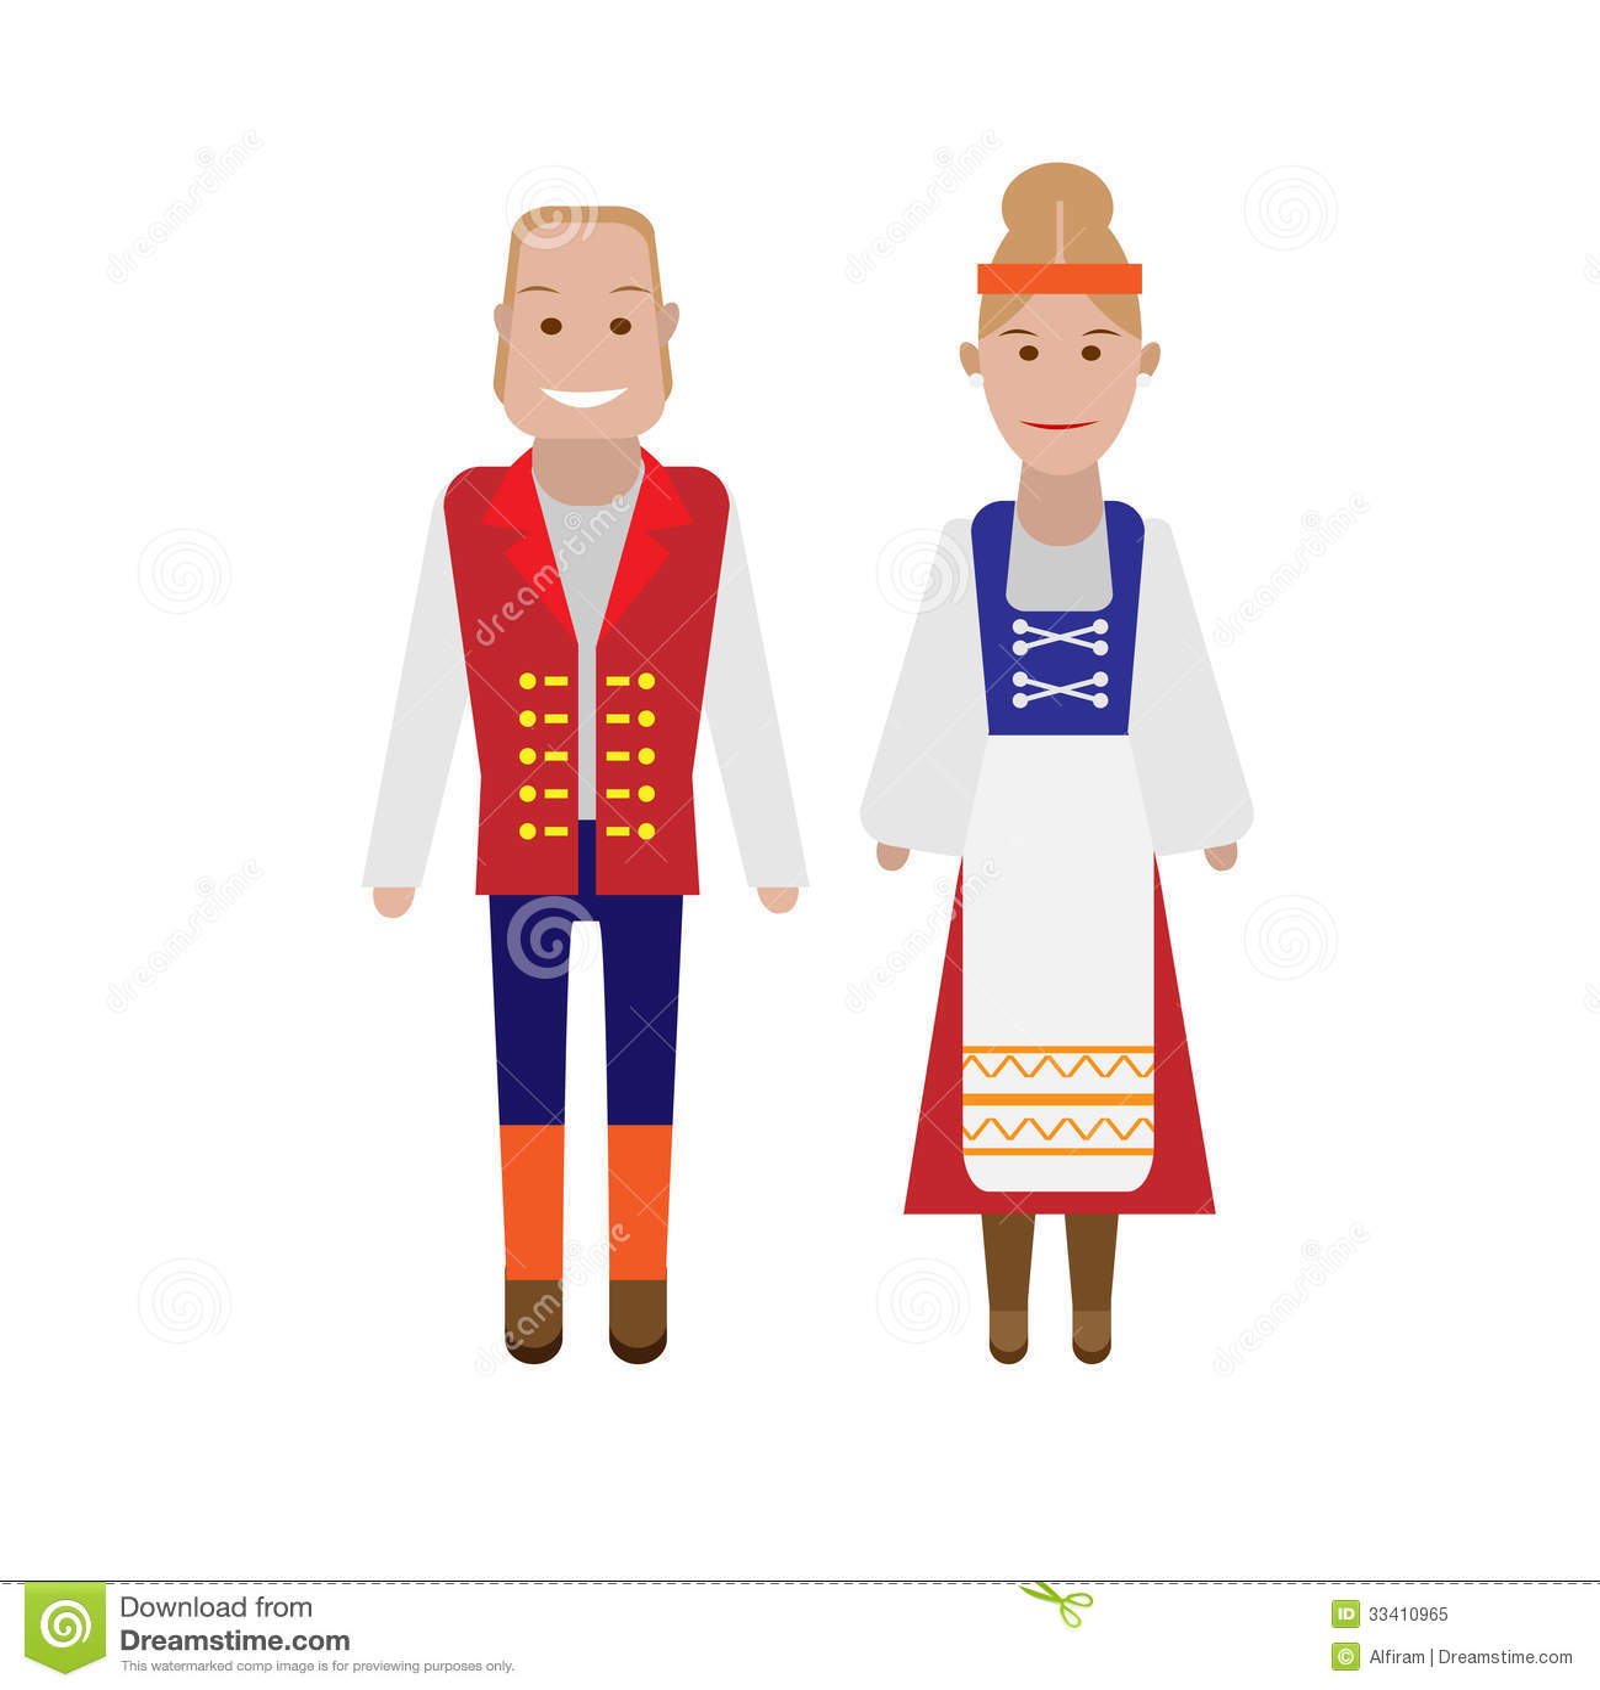 Art Unlimited Sportswear: Finnish National Costume Stock Vector. Illustration Of